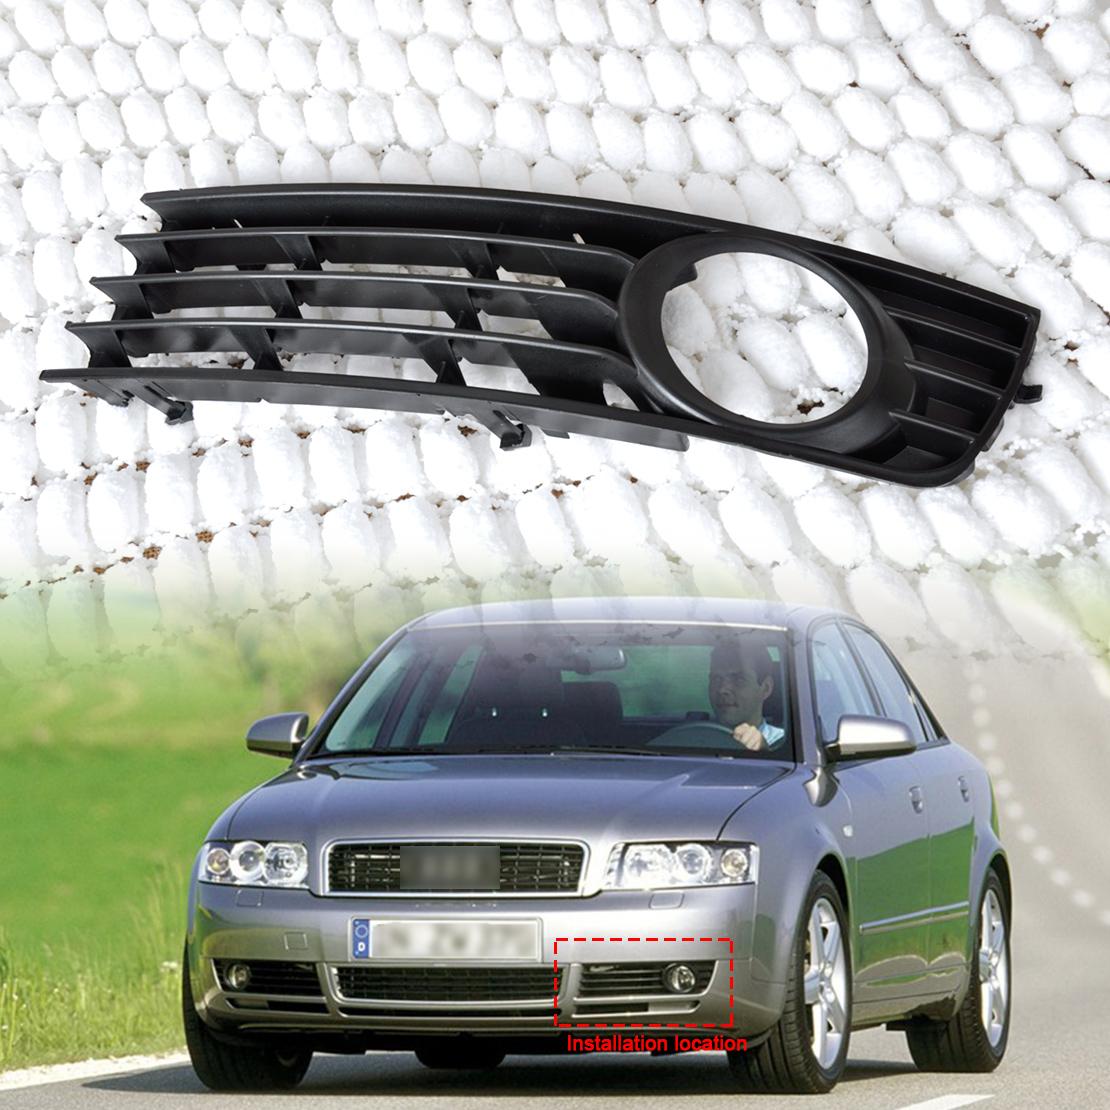 Audi A4 2002 Price: 8E0807681 For 2002-2005 Audi A4 B6 Front Left Bumper Fog